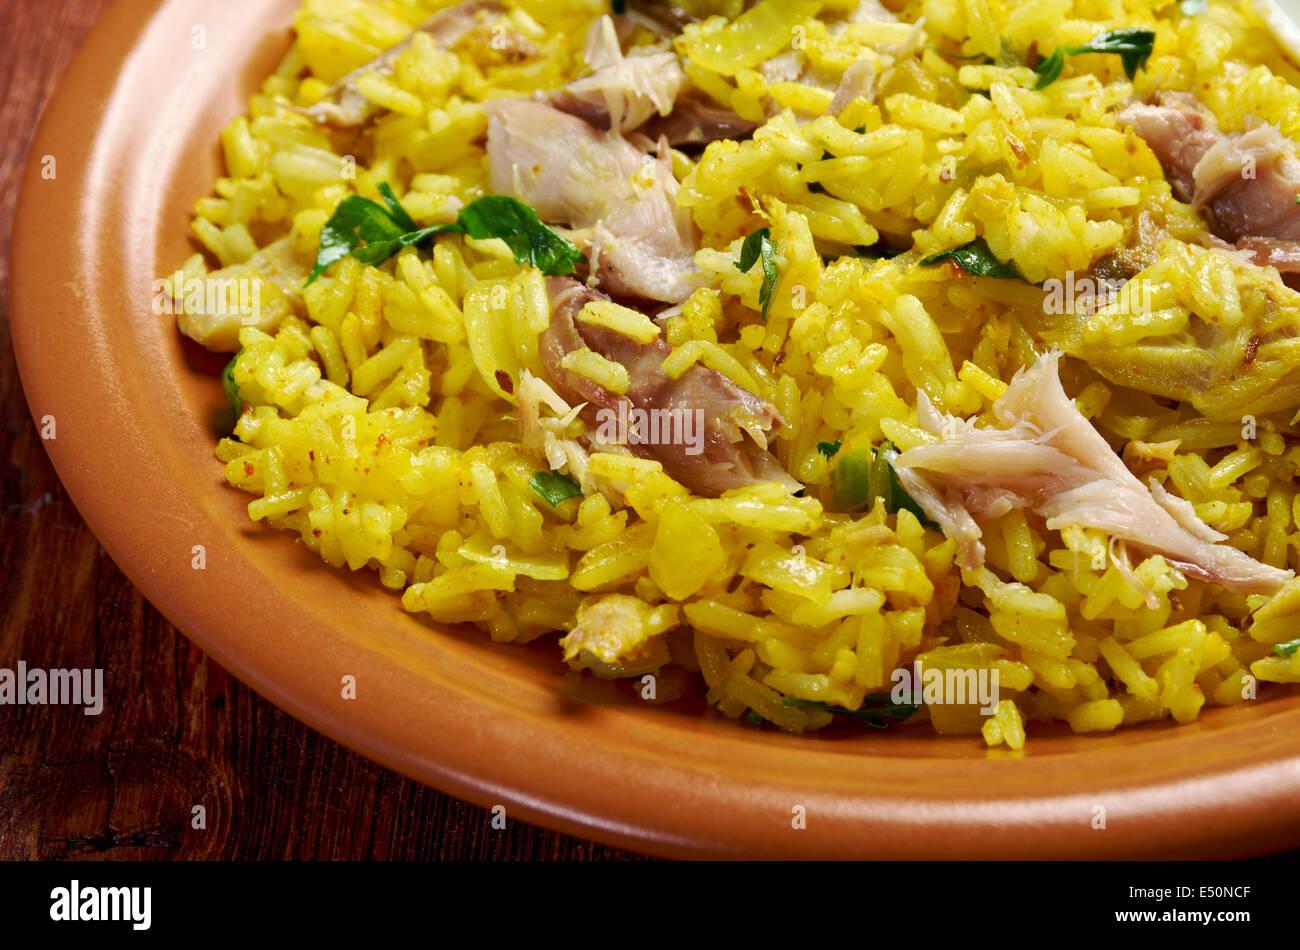 Scottish dish - Kedgeree Stock Photo